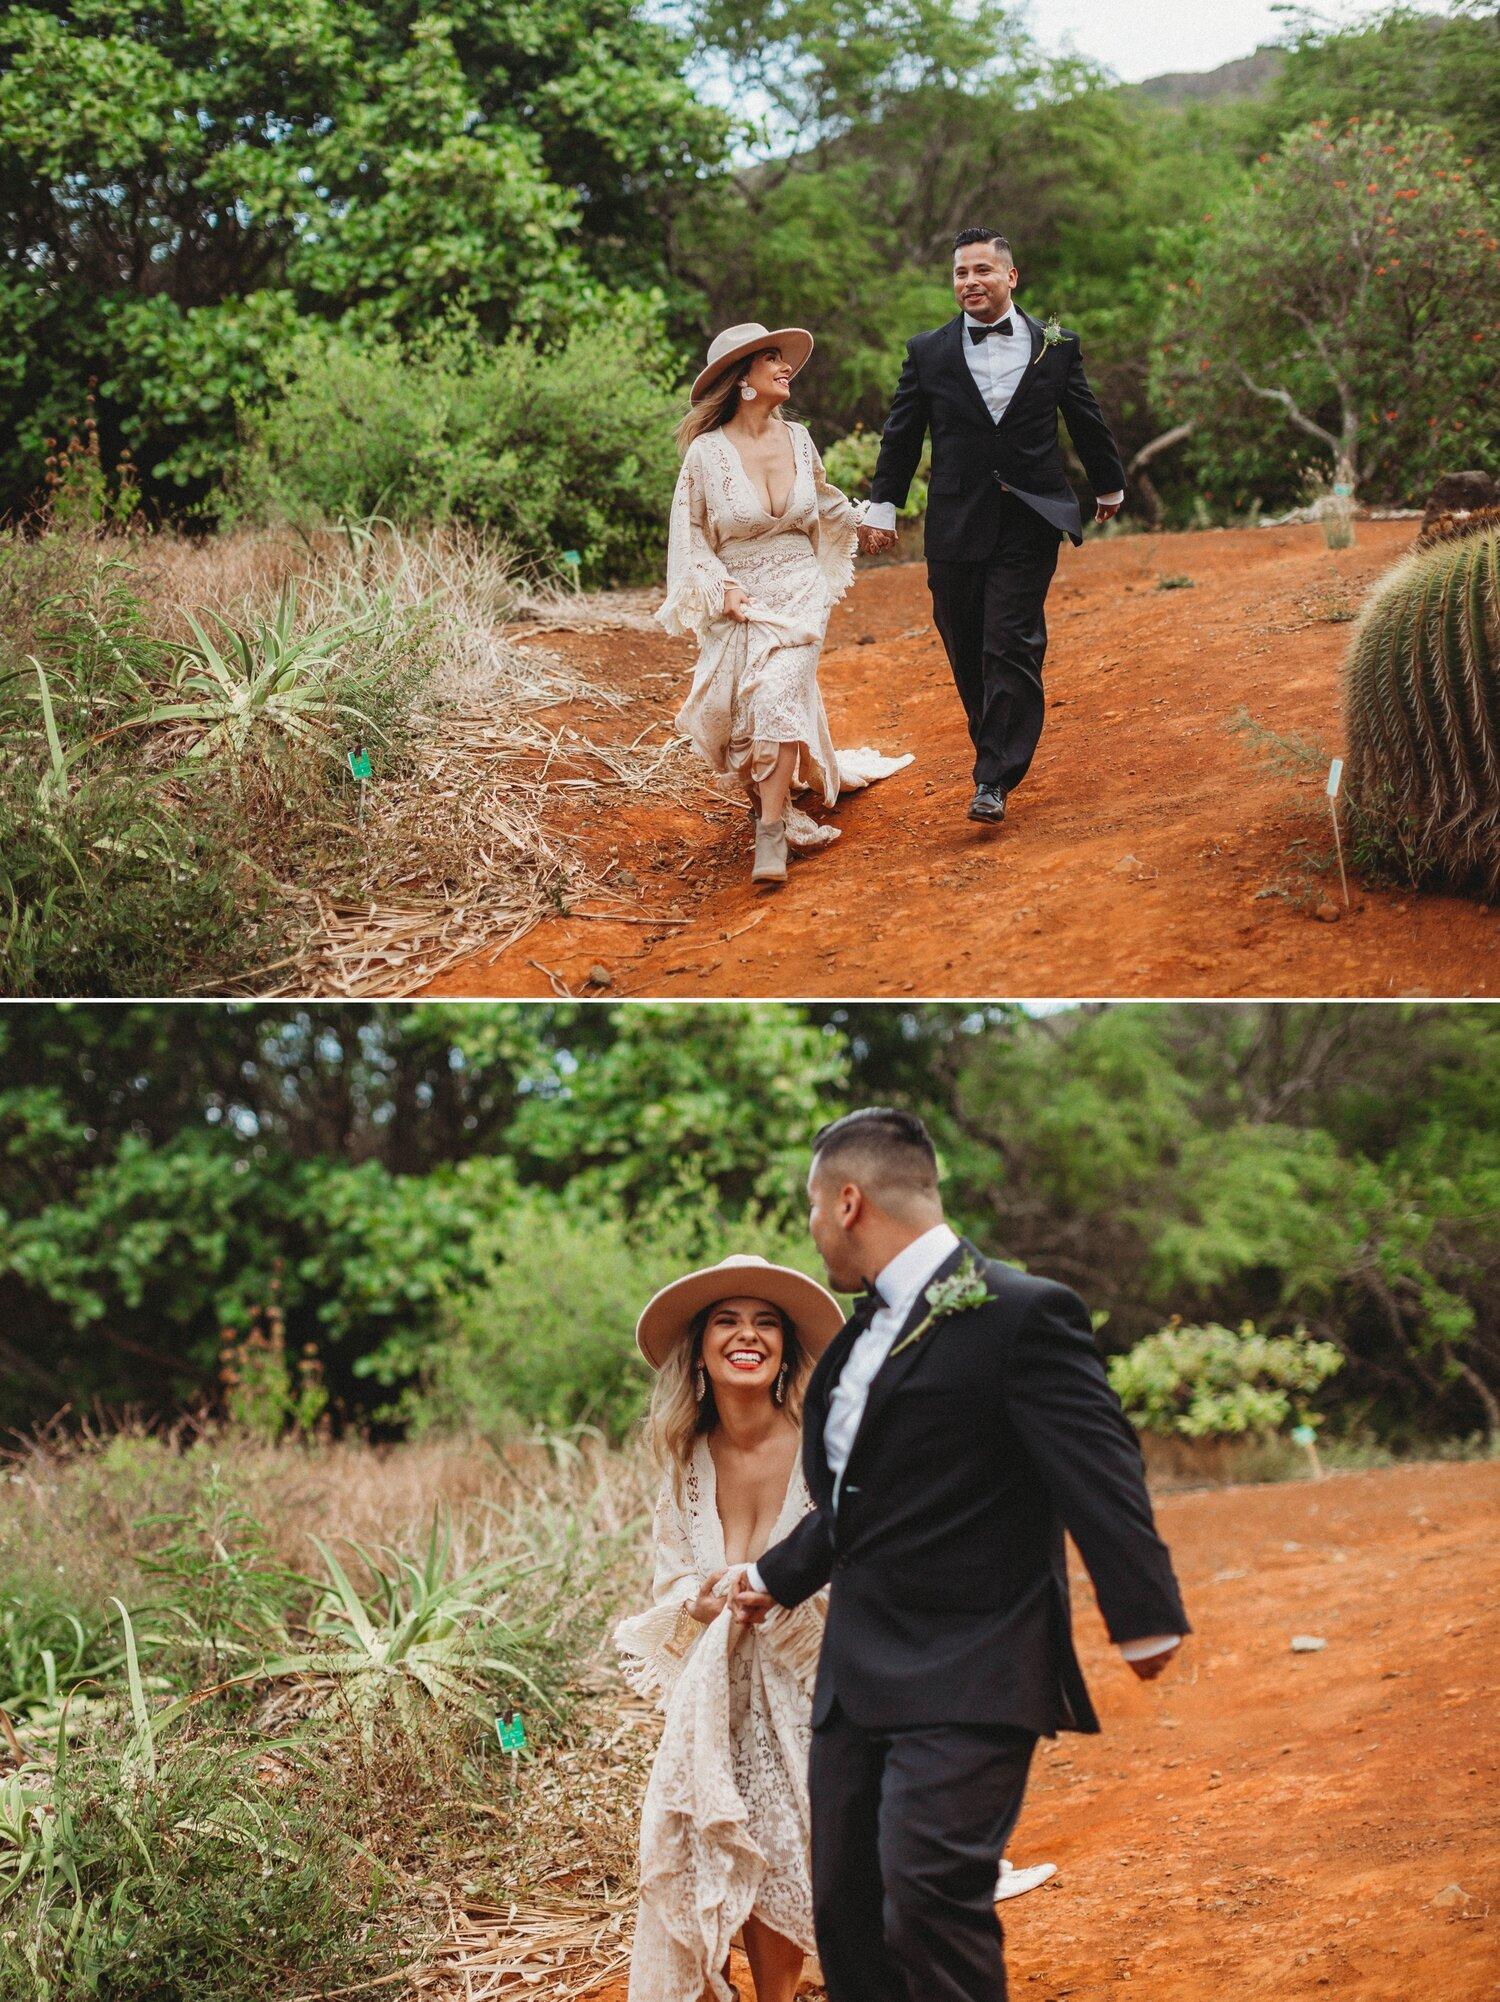 Boho Cactus Elopement - Honolulu, Koko Crater Botanical Garden - Oahu Hawaii Wedding Photographer 34.jpg